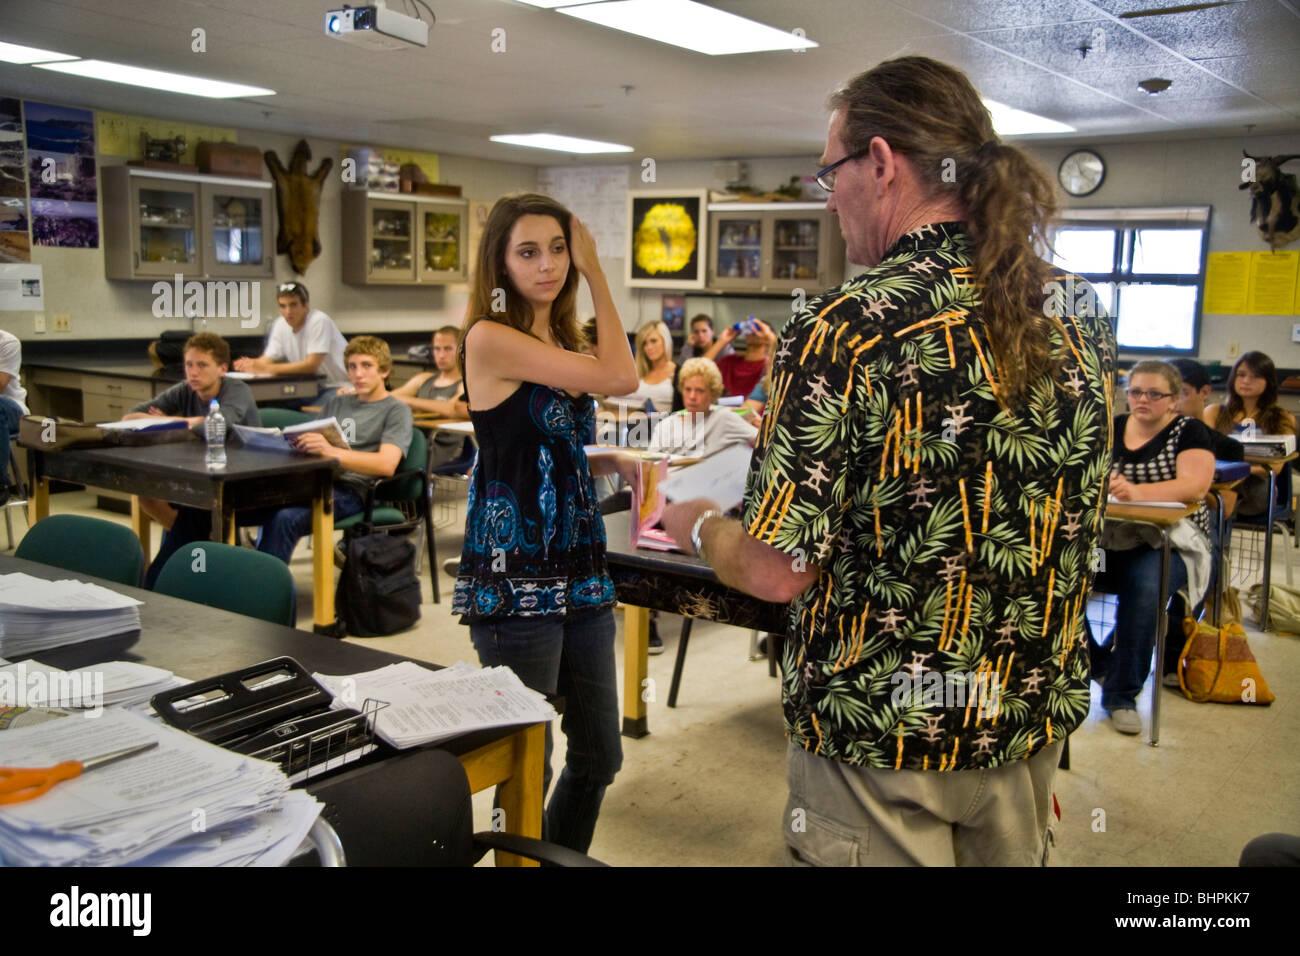 teaching physics to high school students